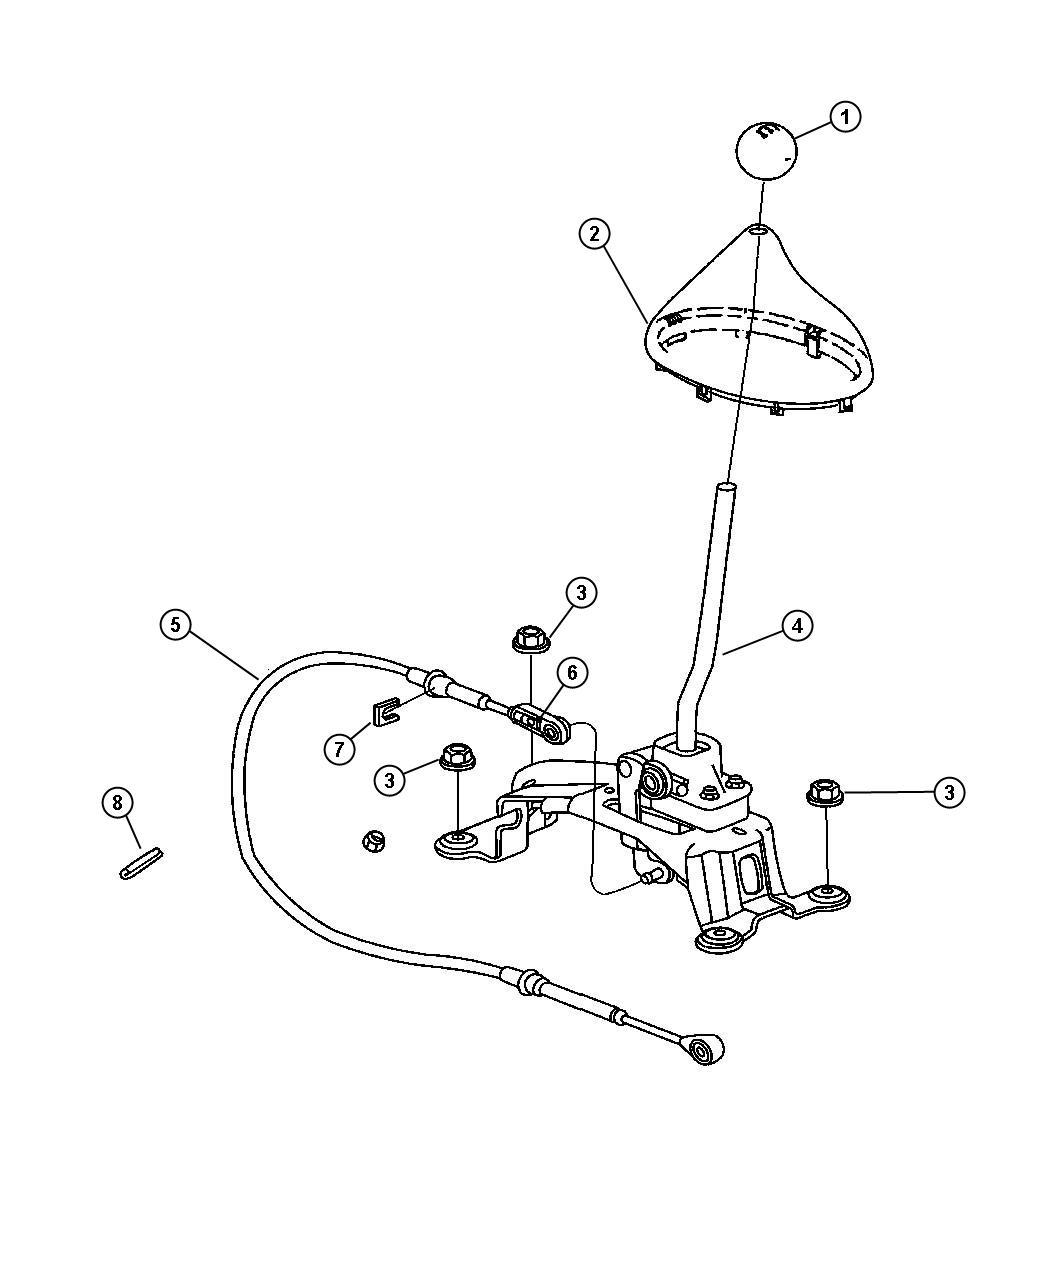 2002 Dodge Stratus Shifter. Transmission. Gear, system